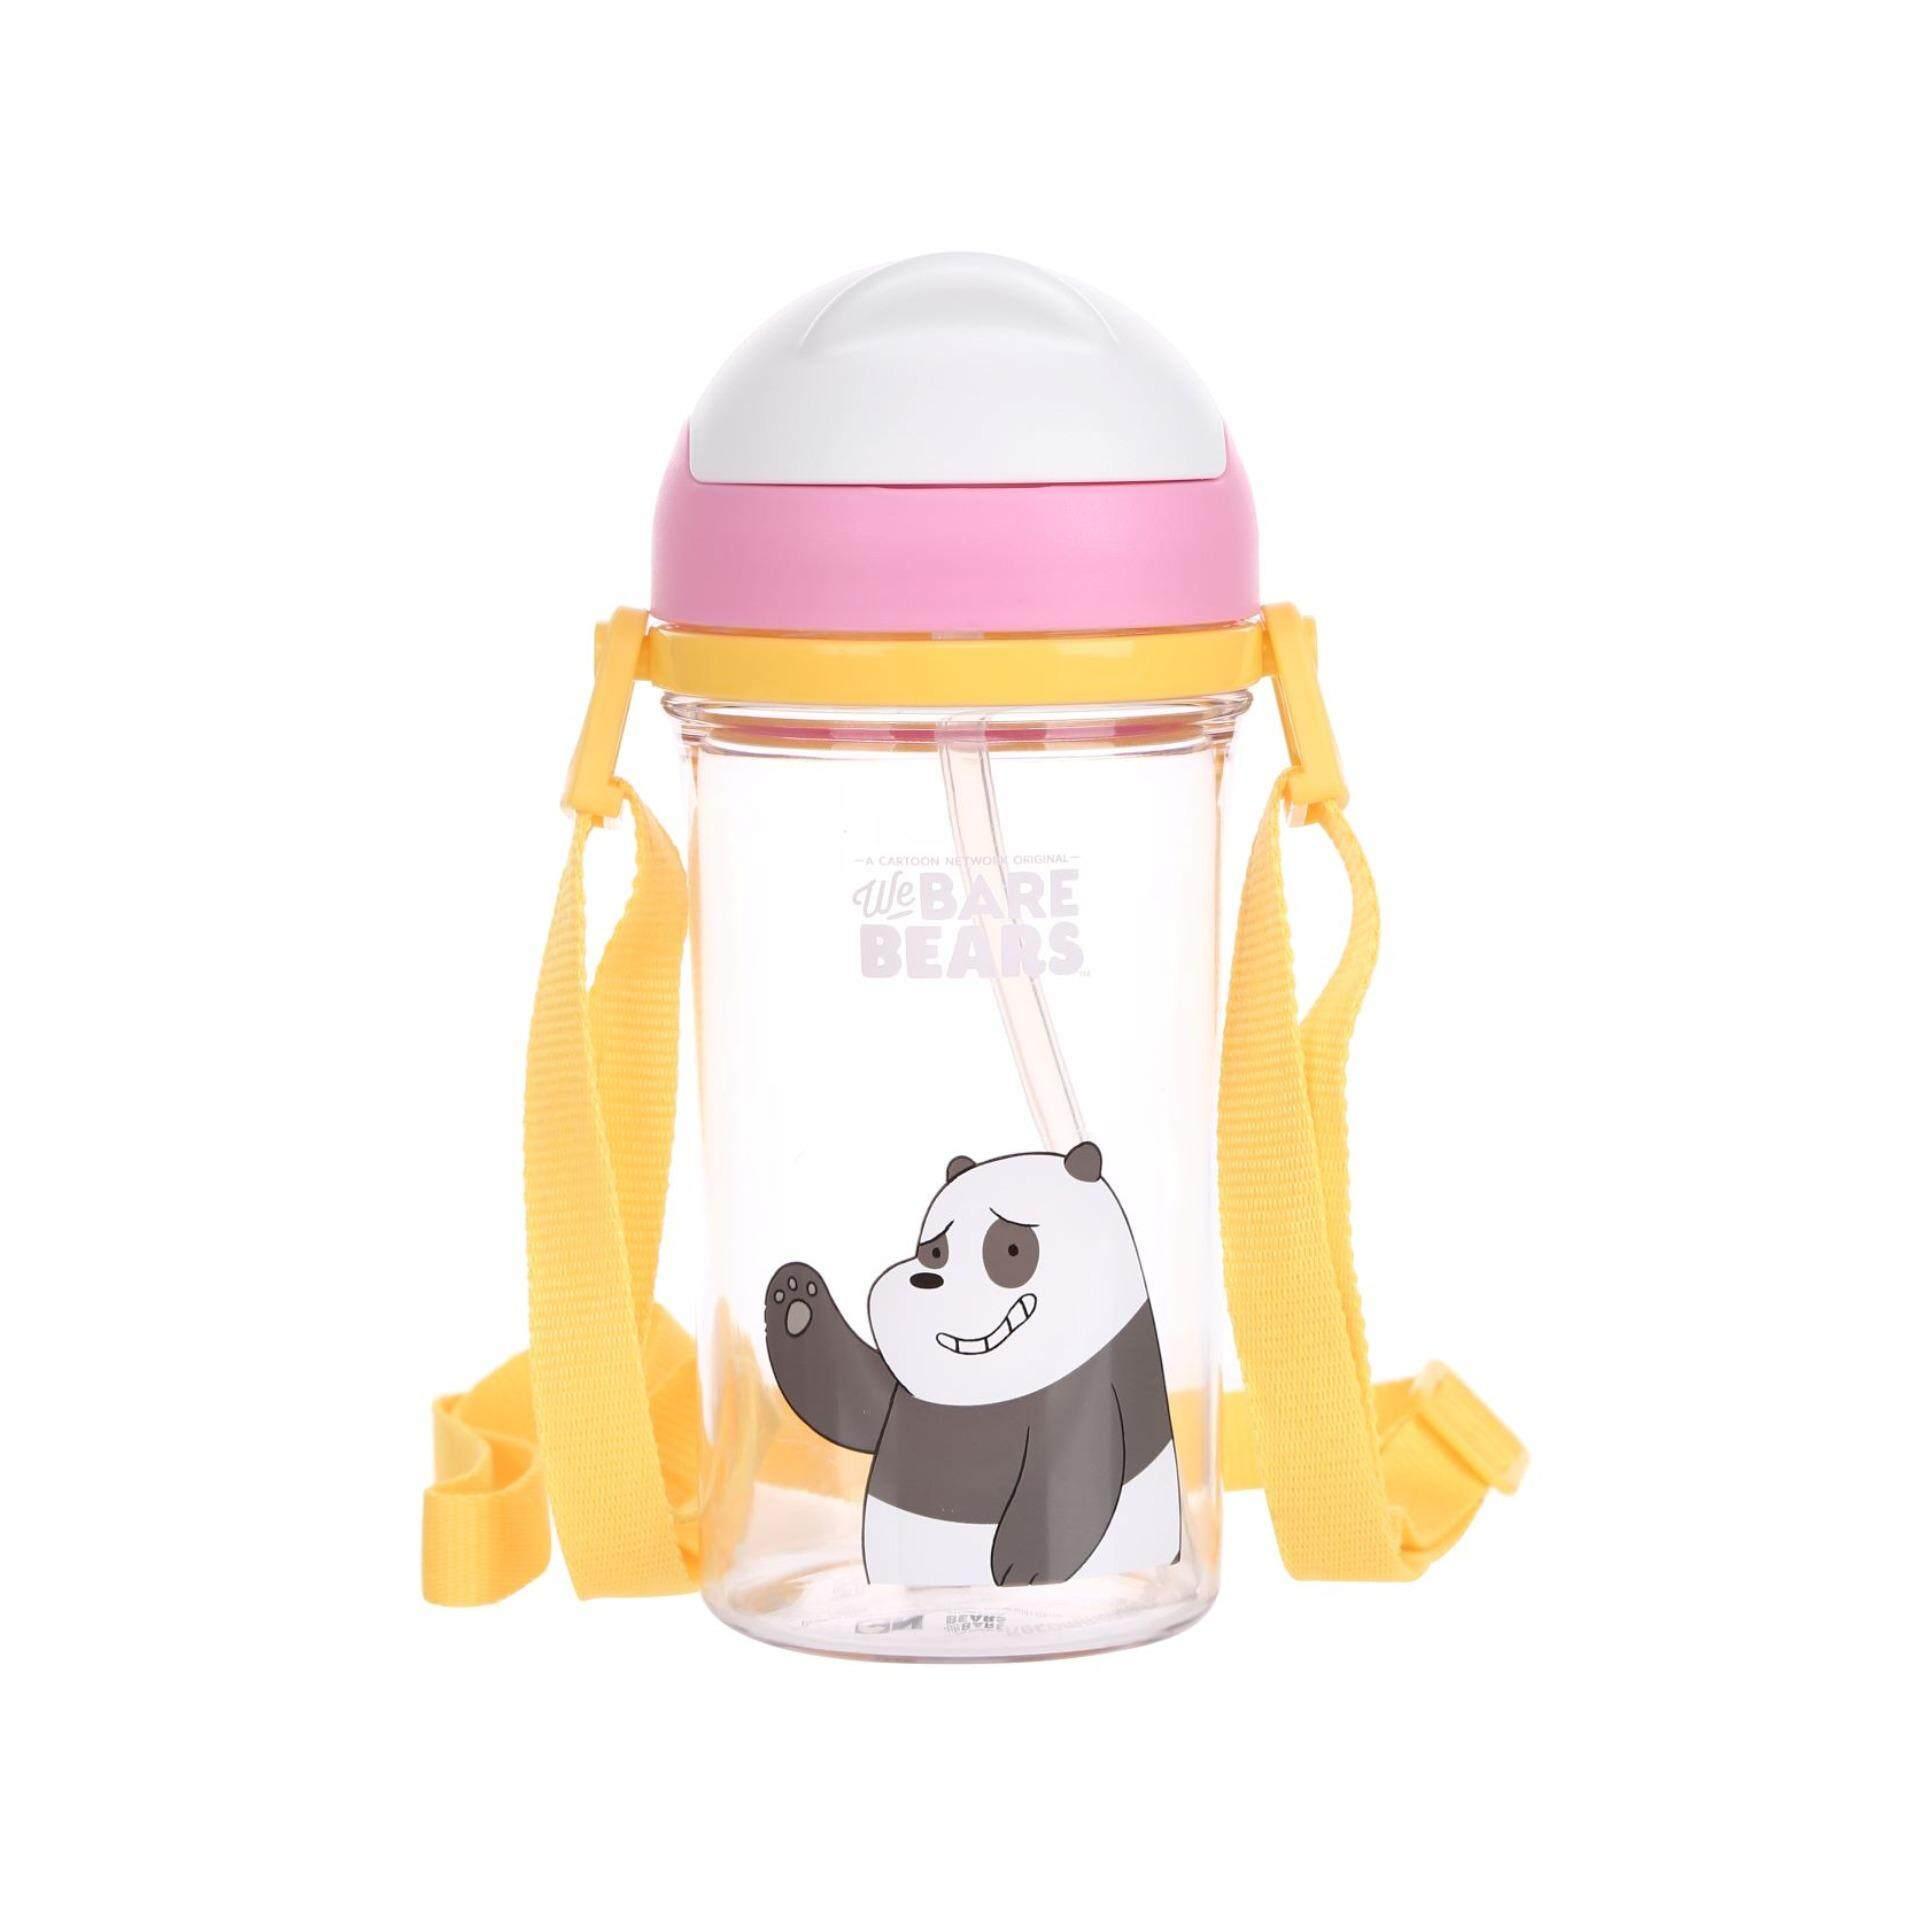 Miniso ขวดน้ำหมีอ้วน We Bare Bears พร้อมหลอด By Miniso Thailand Official.